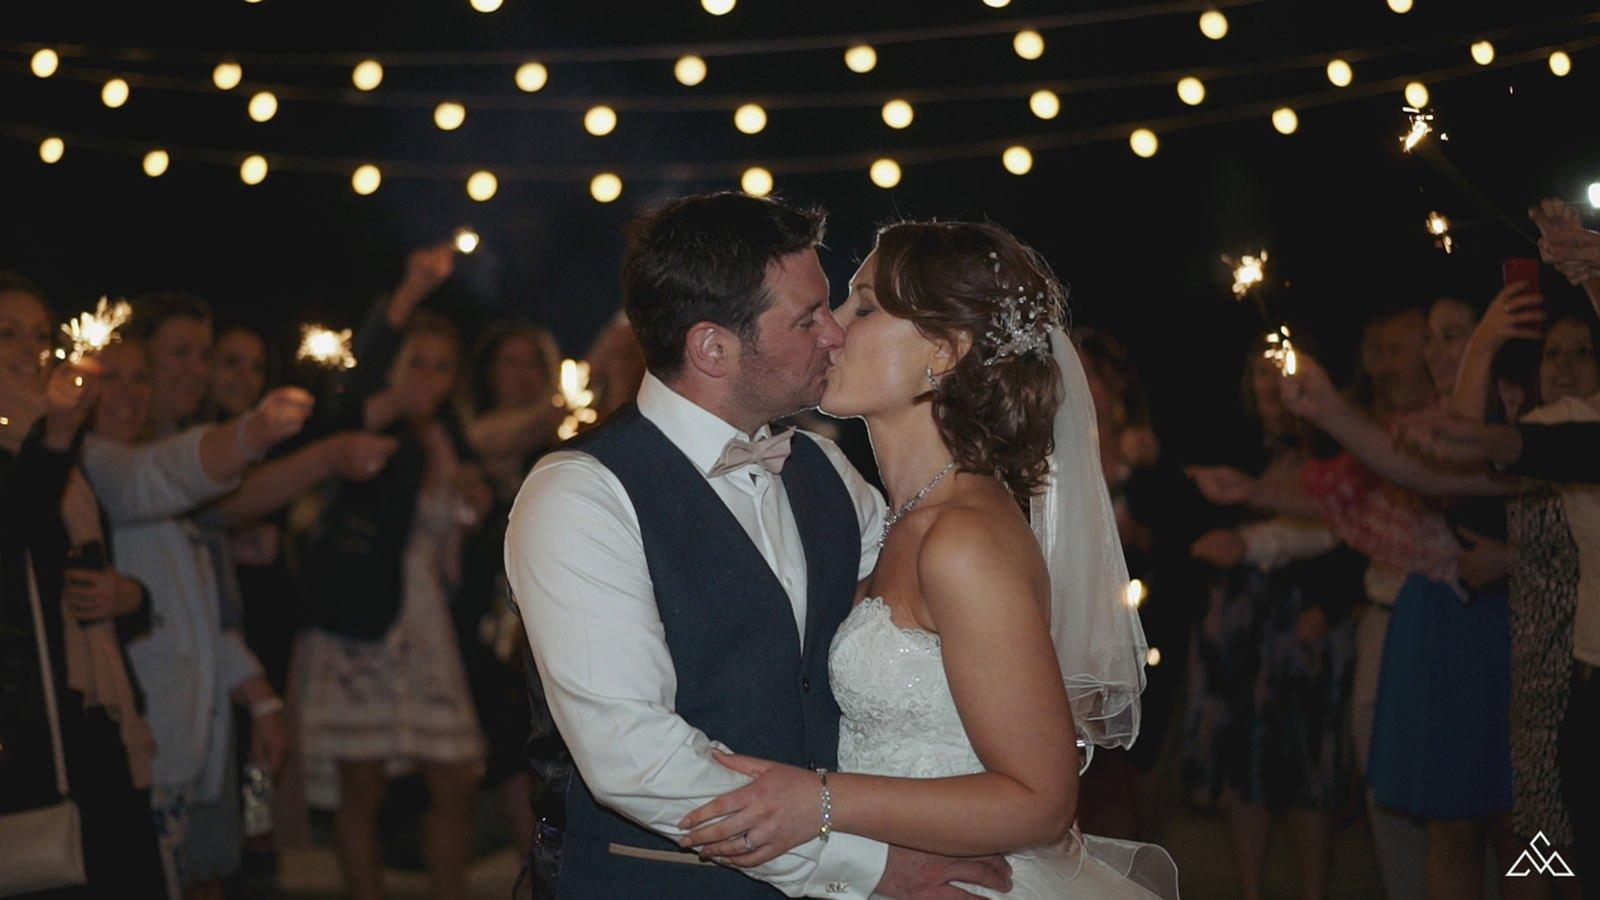 Magical Wedding Sparkler Exit